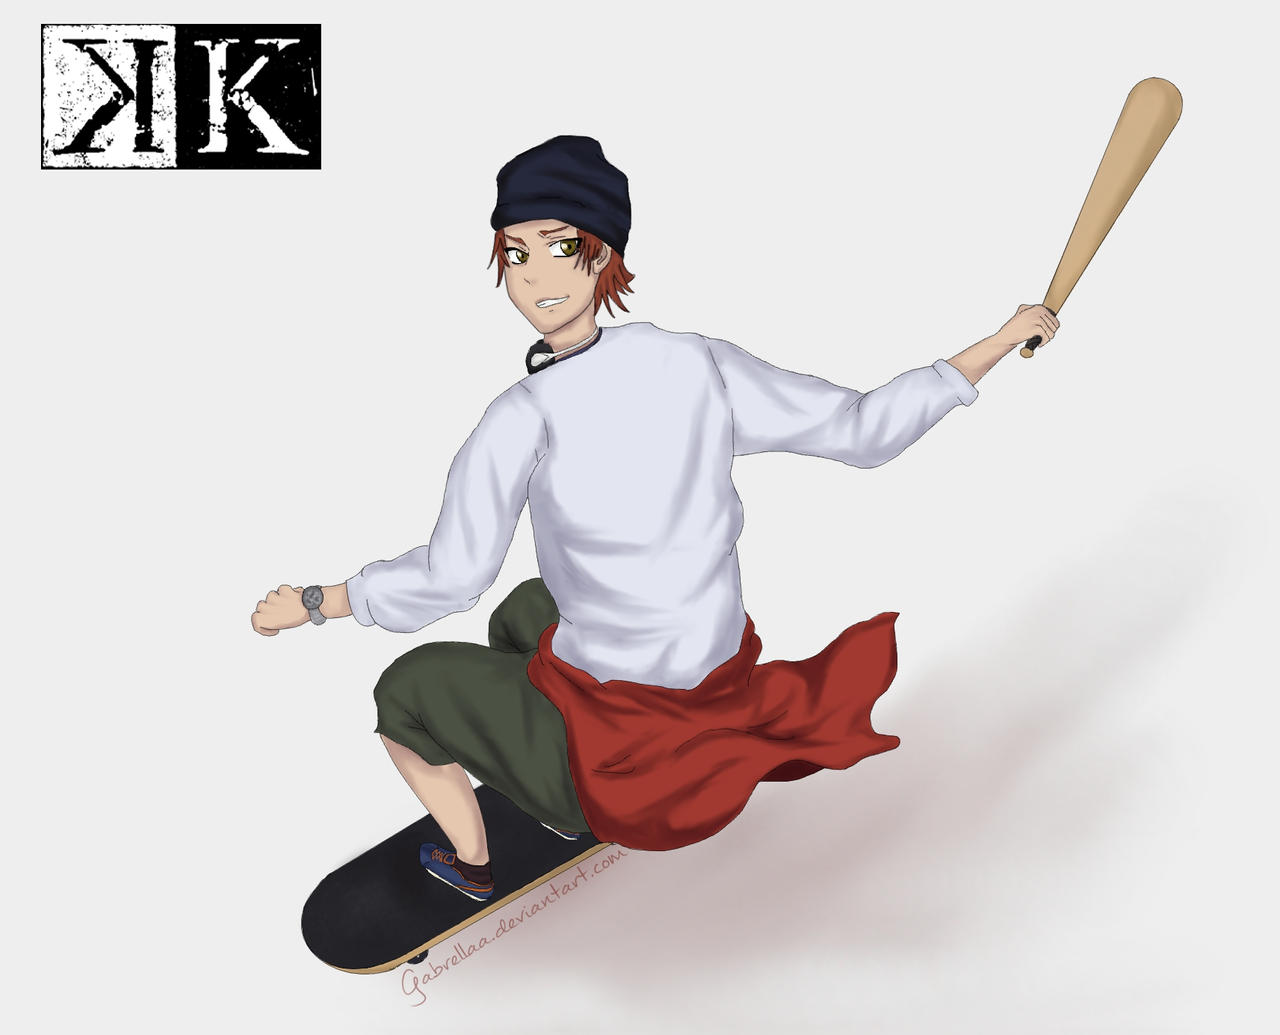 Mi-sa-ki~ by Gabrellaa